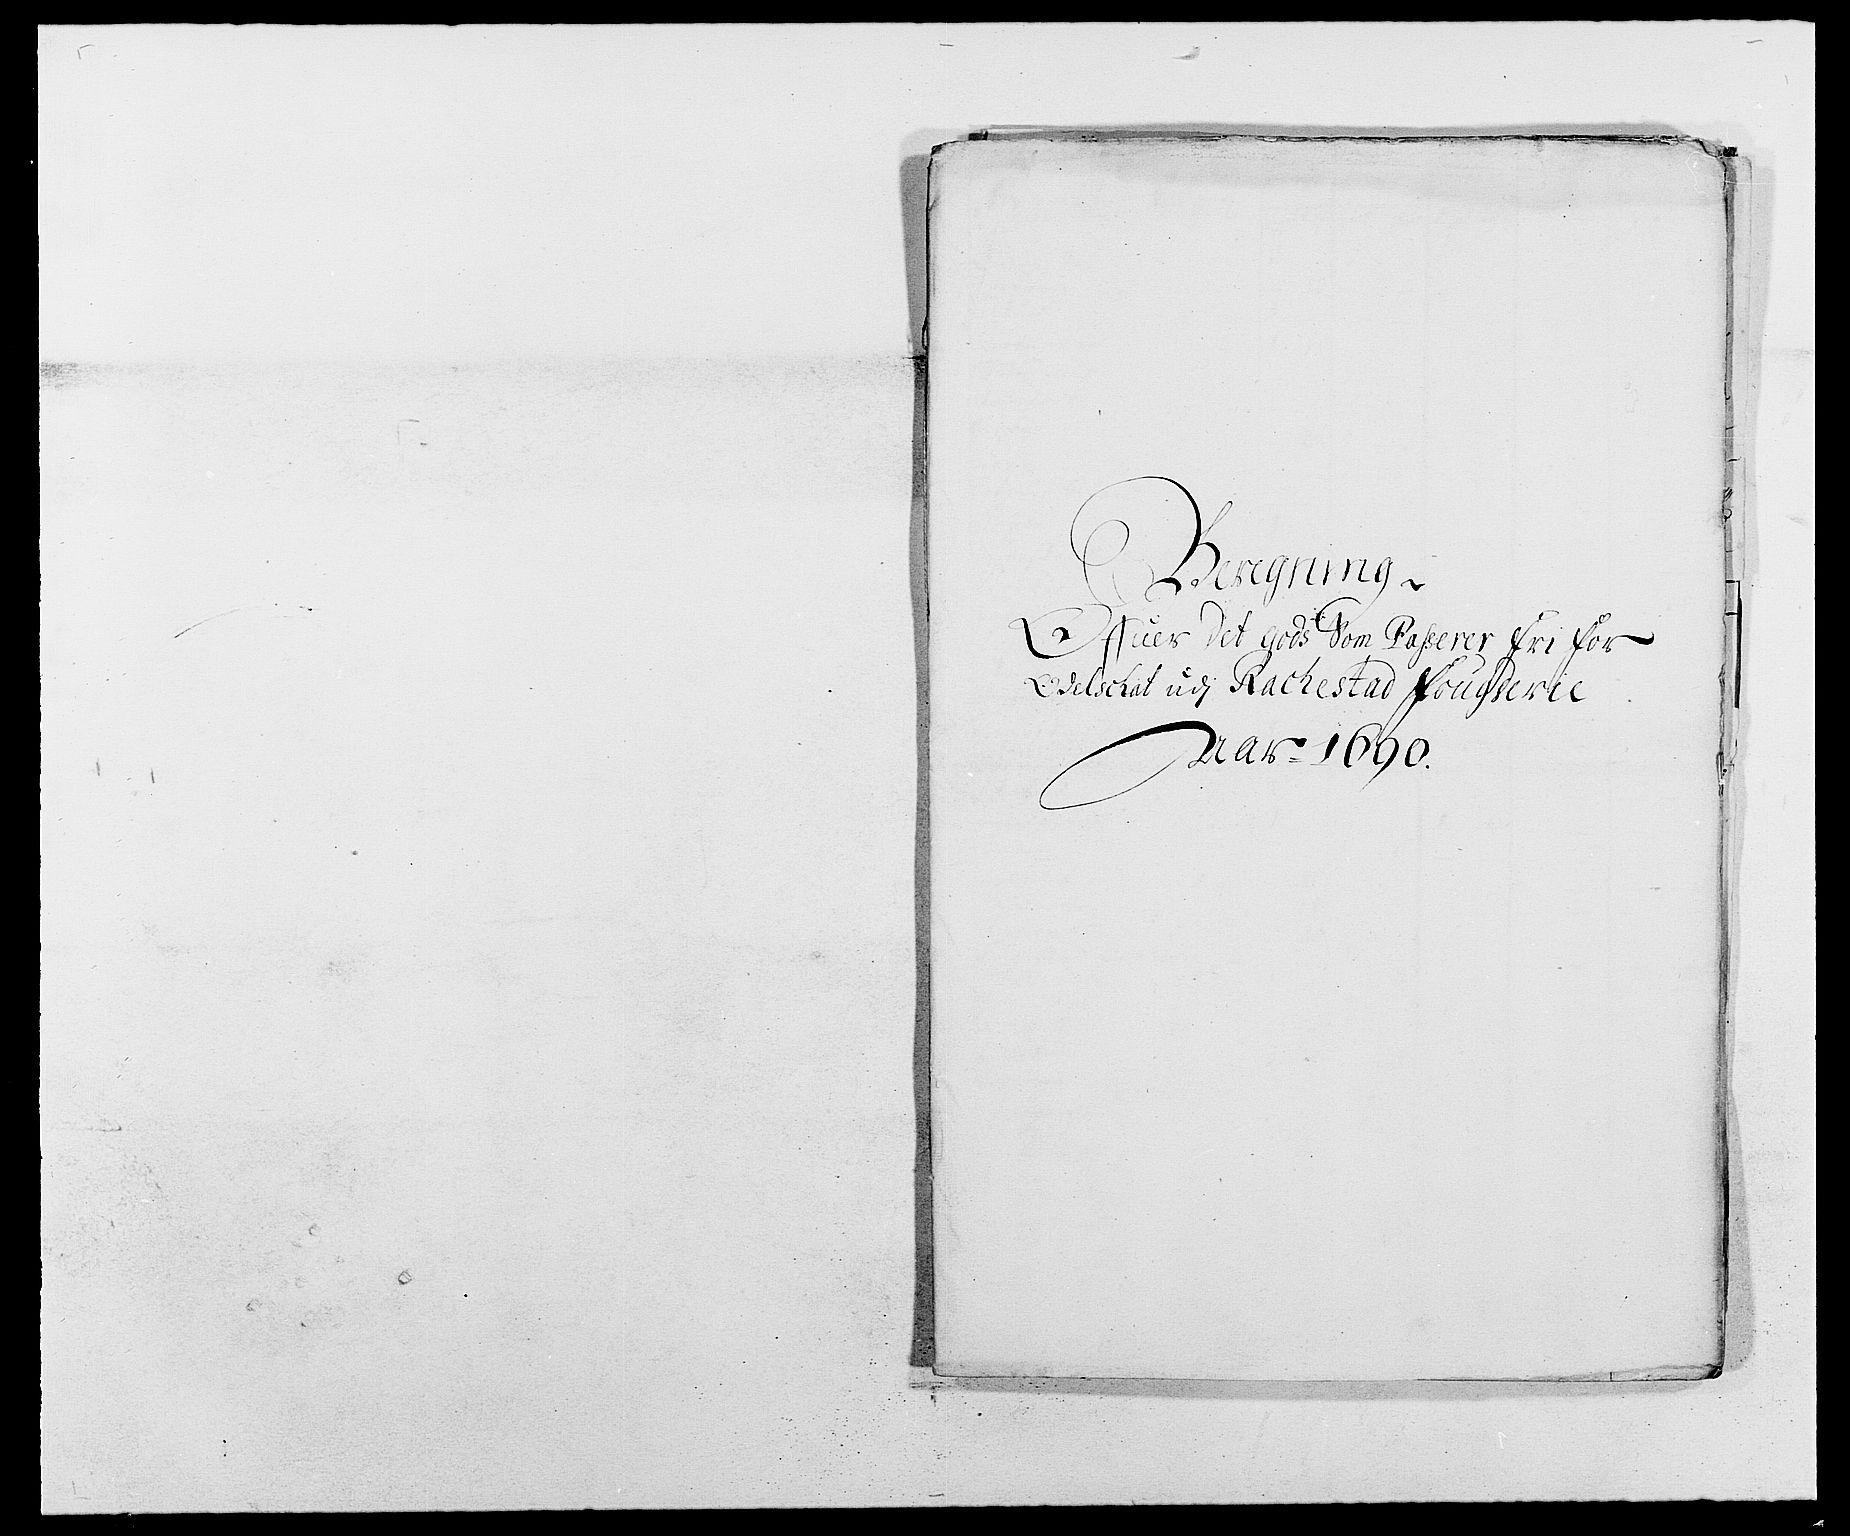 RA, Rentekammeret inntil 1814, Reviderte regnskaper, Fogderegnskap, R05/L0277: Fogderegnskap Rakkestad, 1689-1690, s. 366